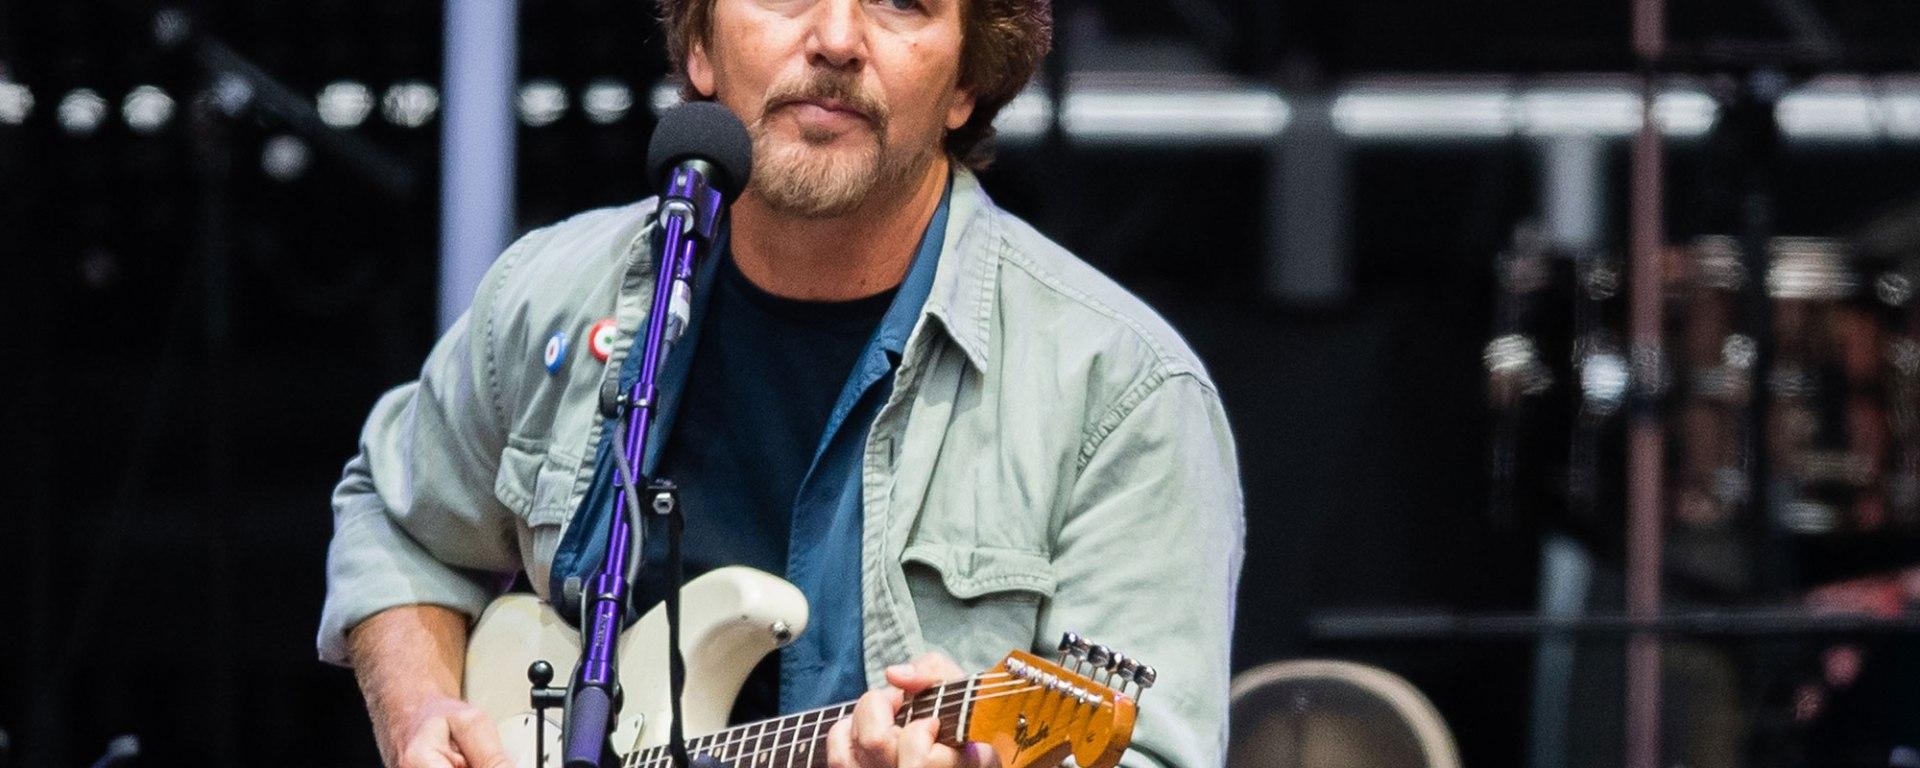 Eddie Vedder a lansat piesa 'Long Way' și anunță albumul 'Earthling'